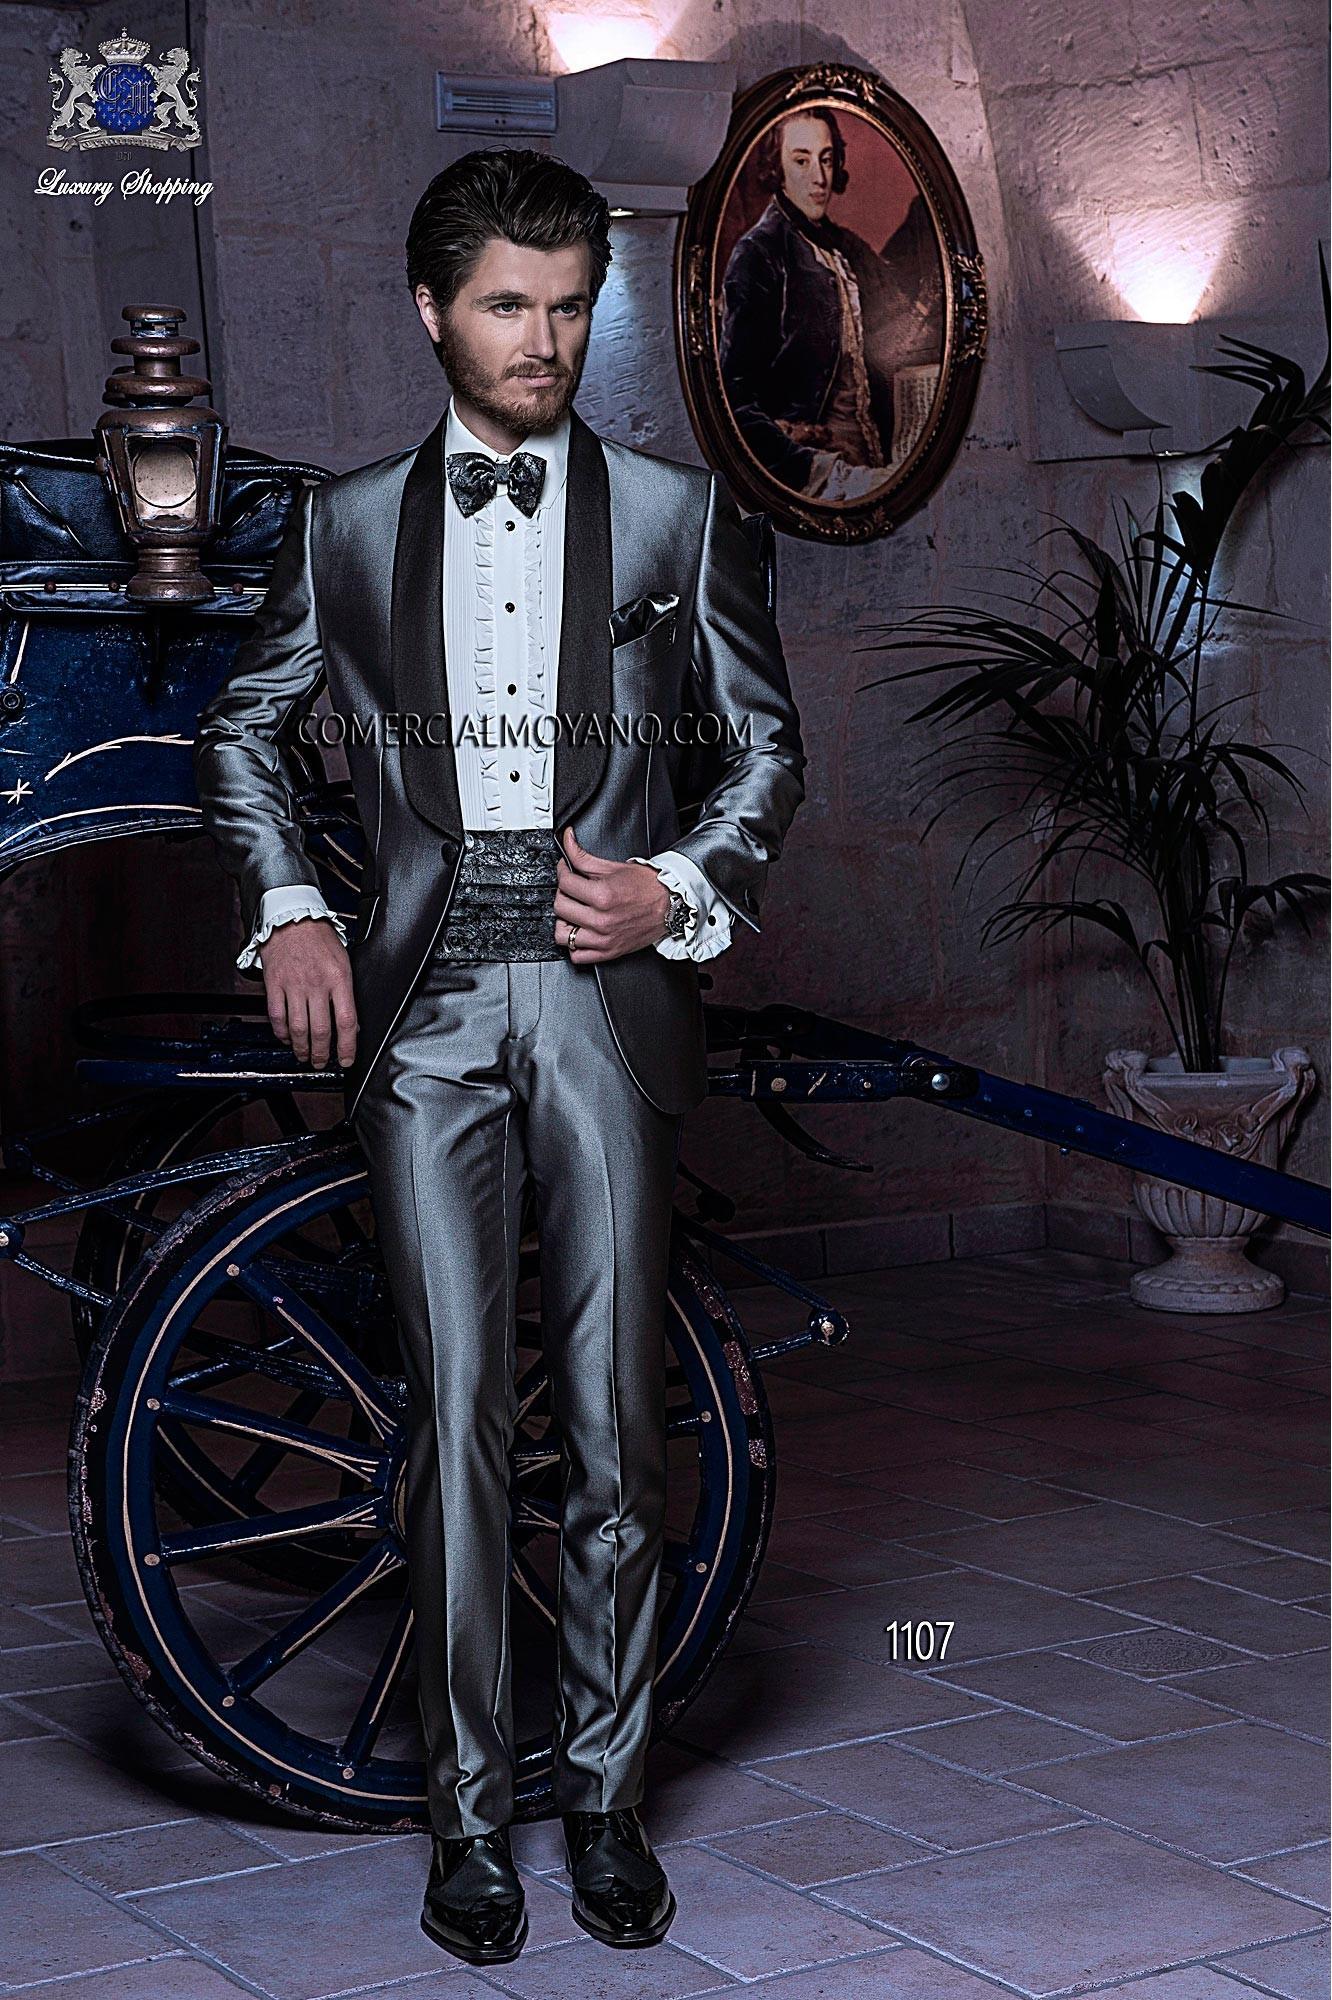 Black Tie Gray men wedding suit model 1107 Ottavio Nuccio Gala